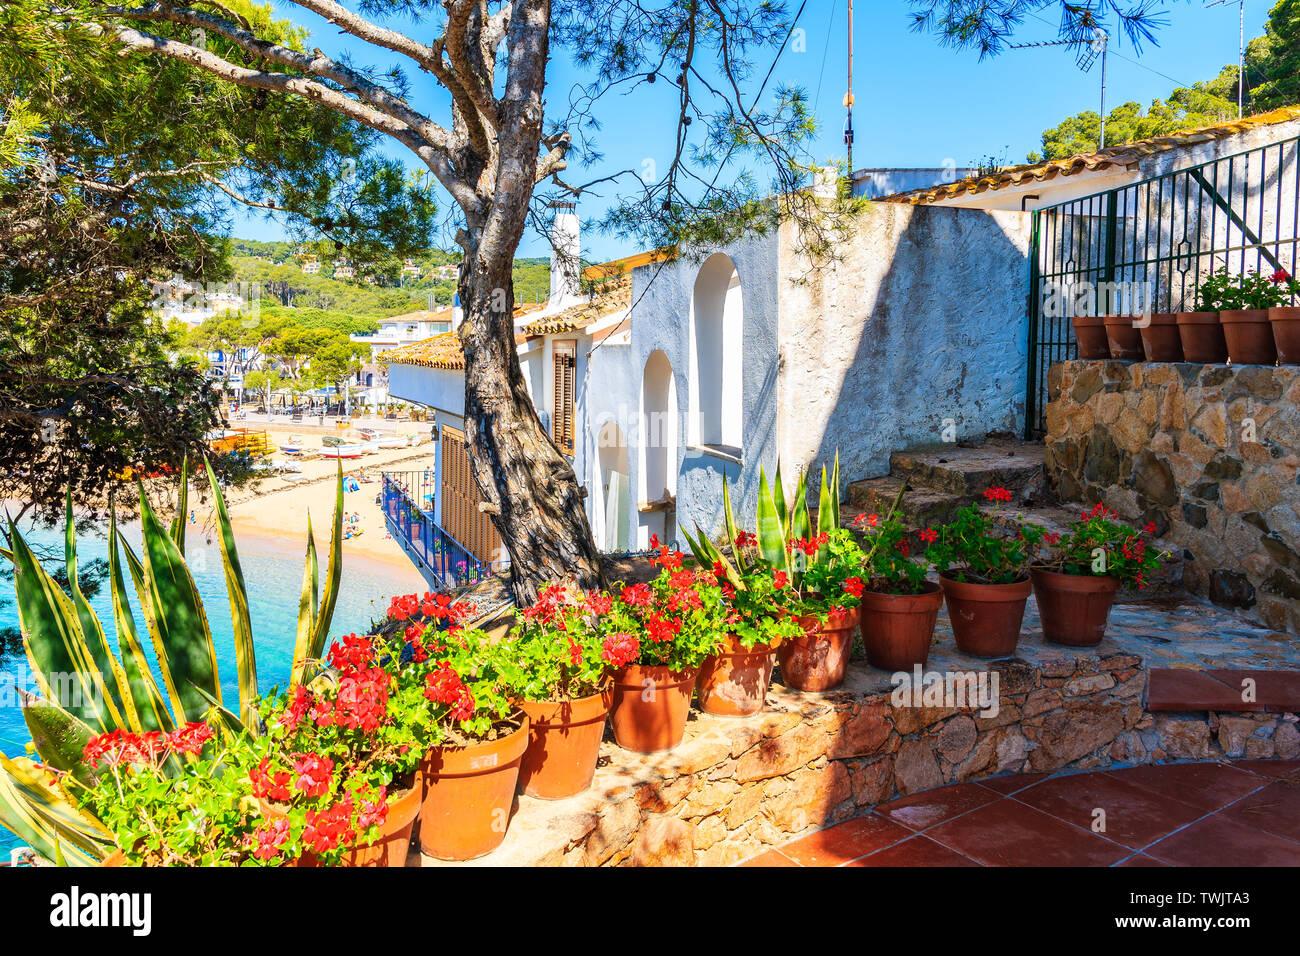 Flowers in pots on terrace of a house in Tamariu village, Costa Brava, Spain Stock Photo